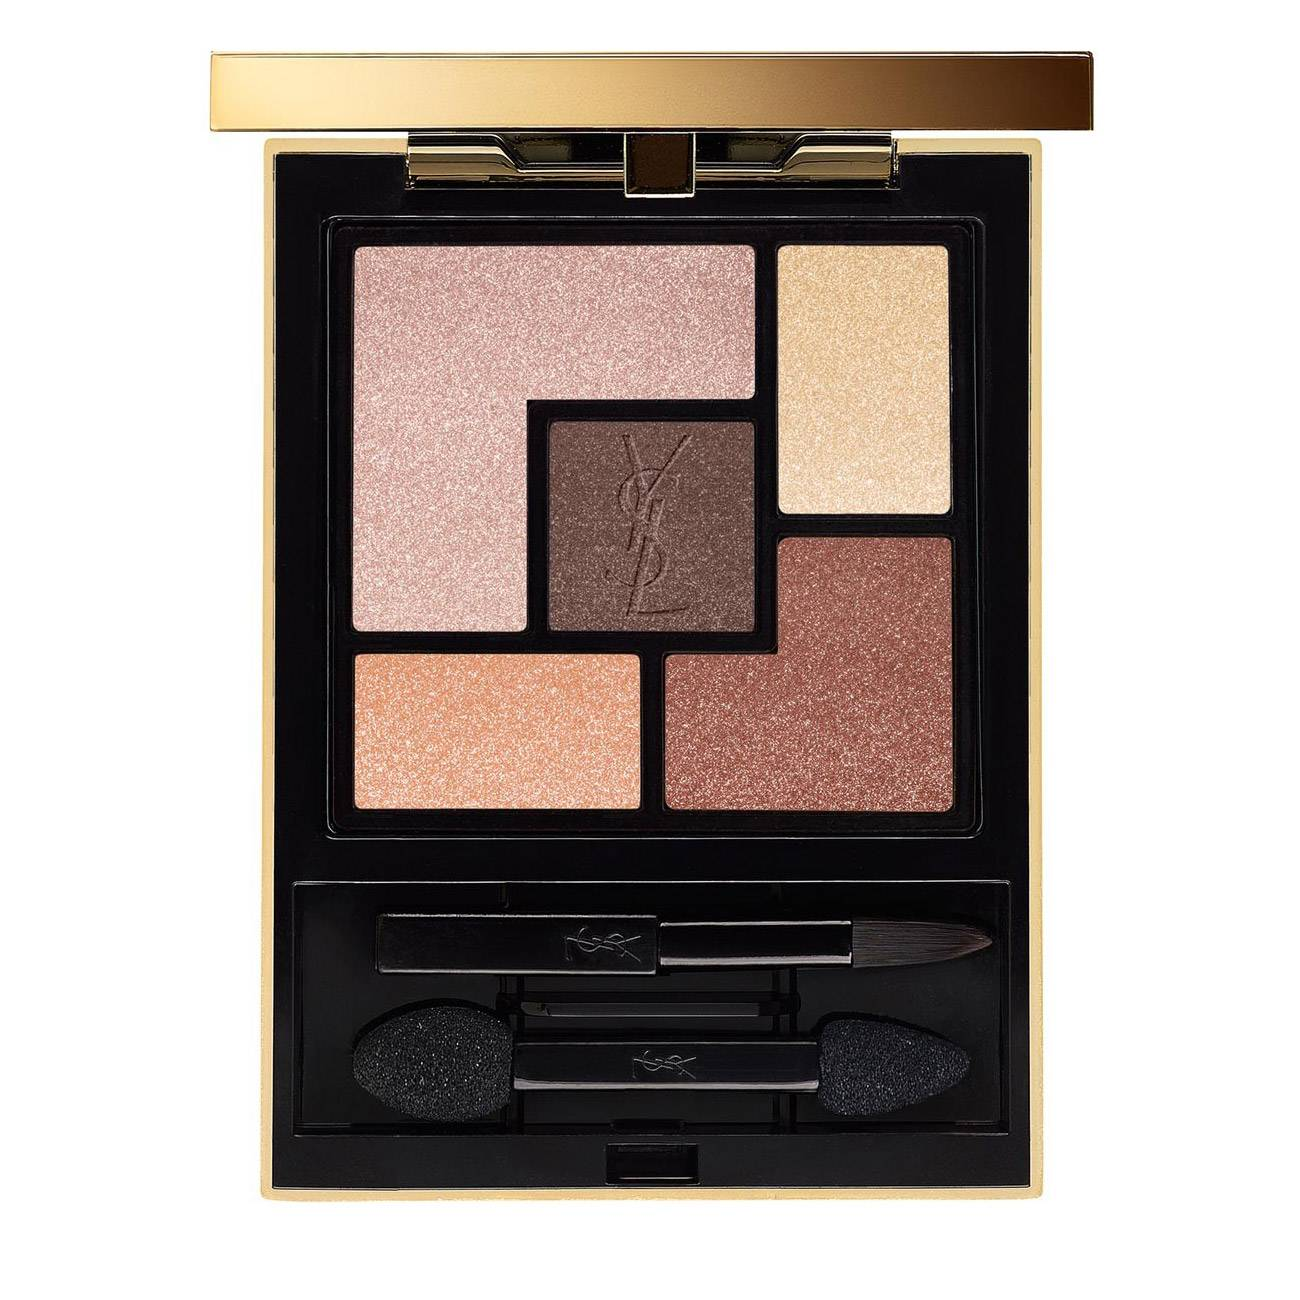 Couture Eye Pallette 5 Grame Yves Saint Laurent imagine 2021 bestvalue.eu